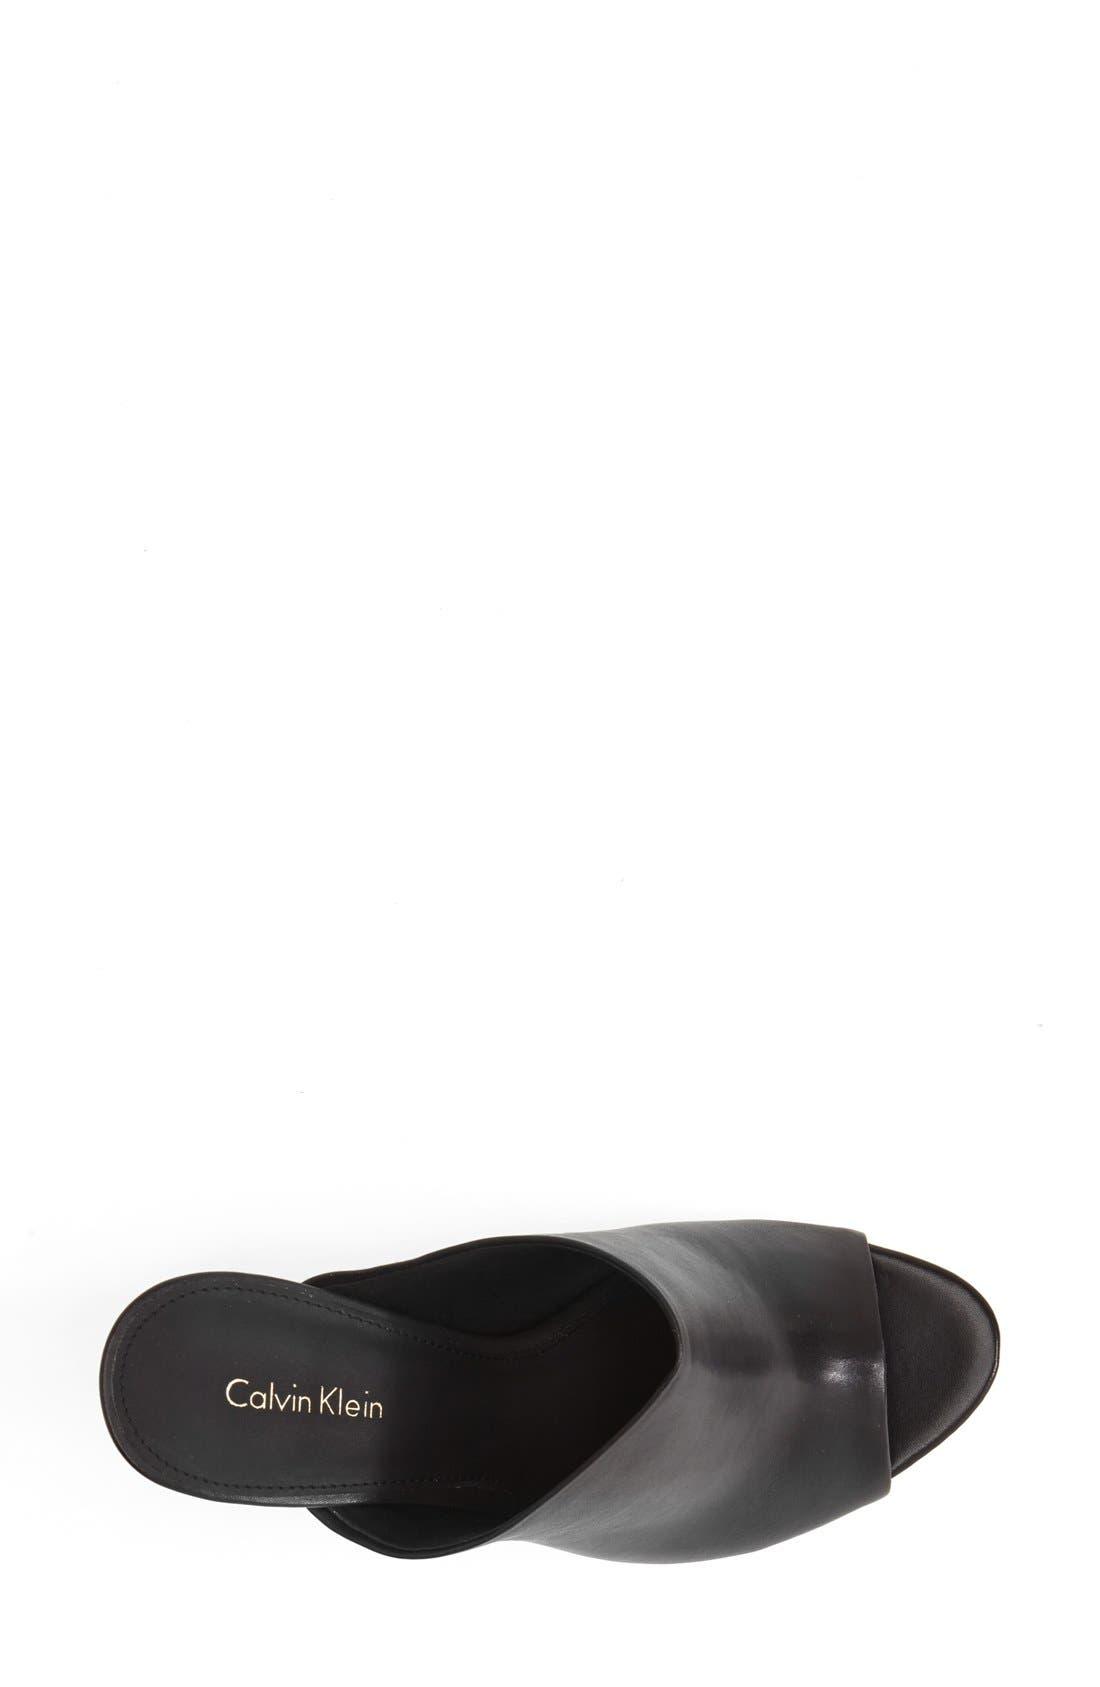 CALVIN KLEIN,                             'Gradyn' Peep Toe Mule Sandal,                             Alternate thumbnail 4, color,                             001